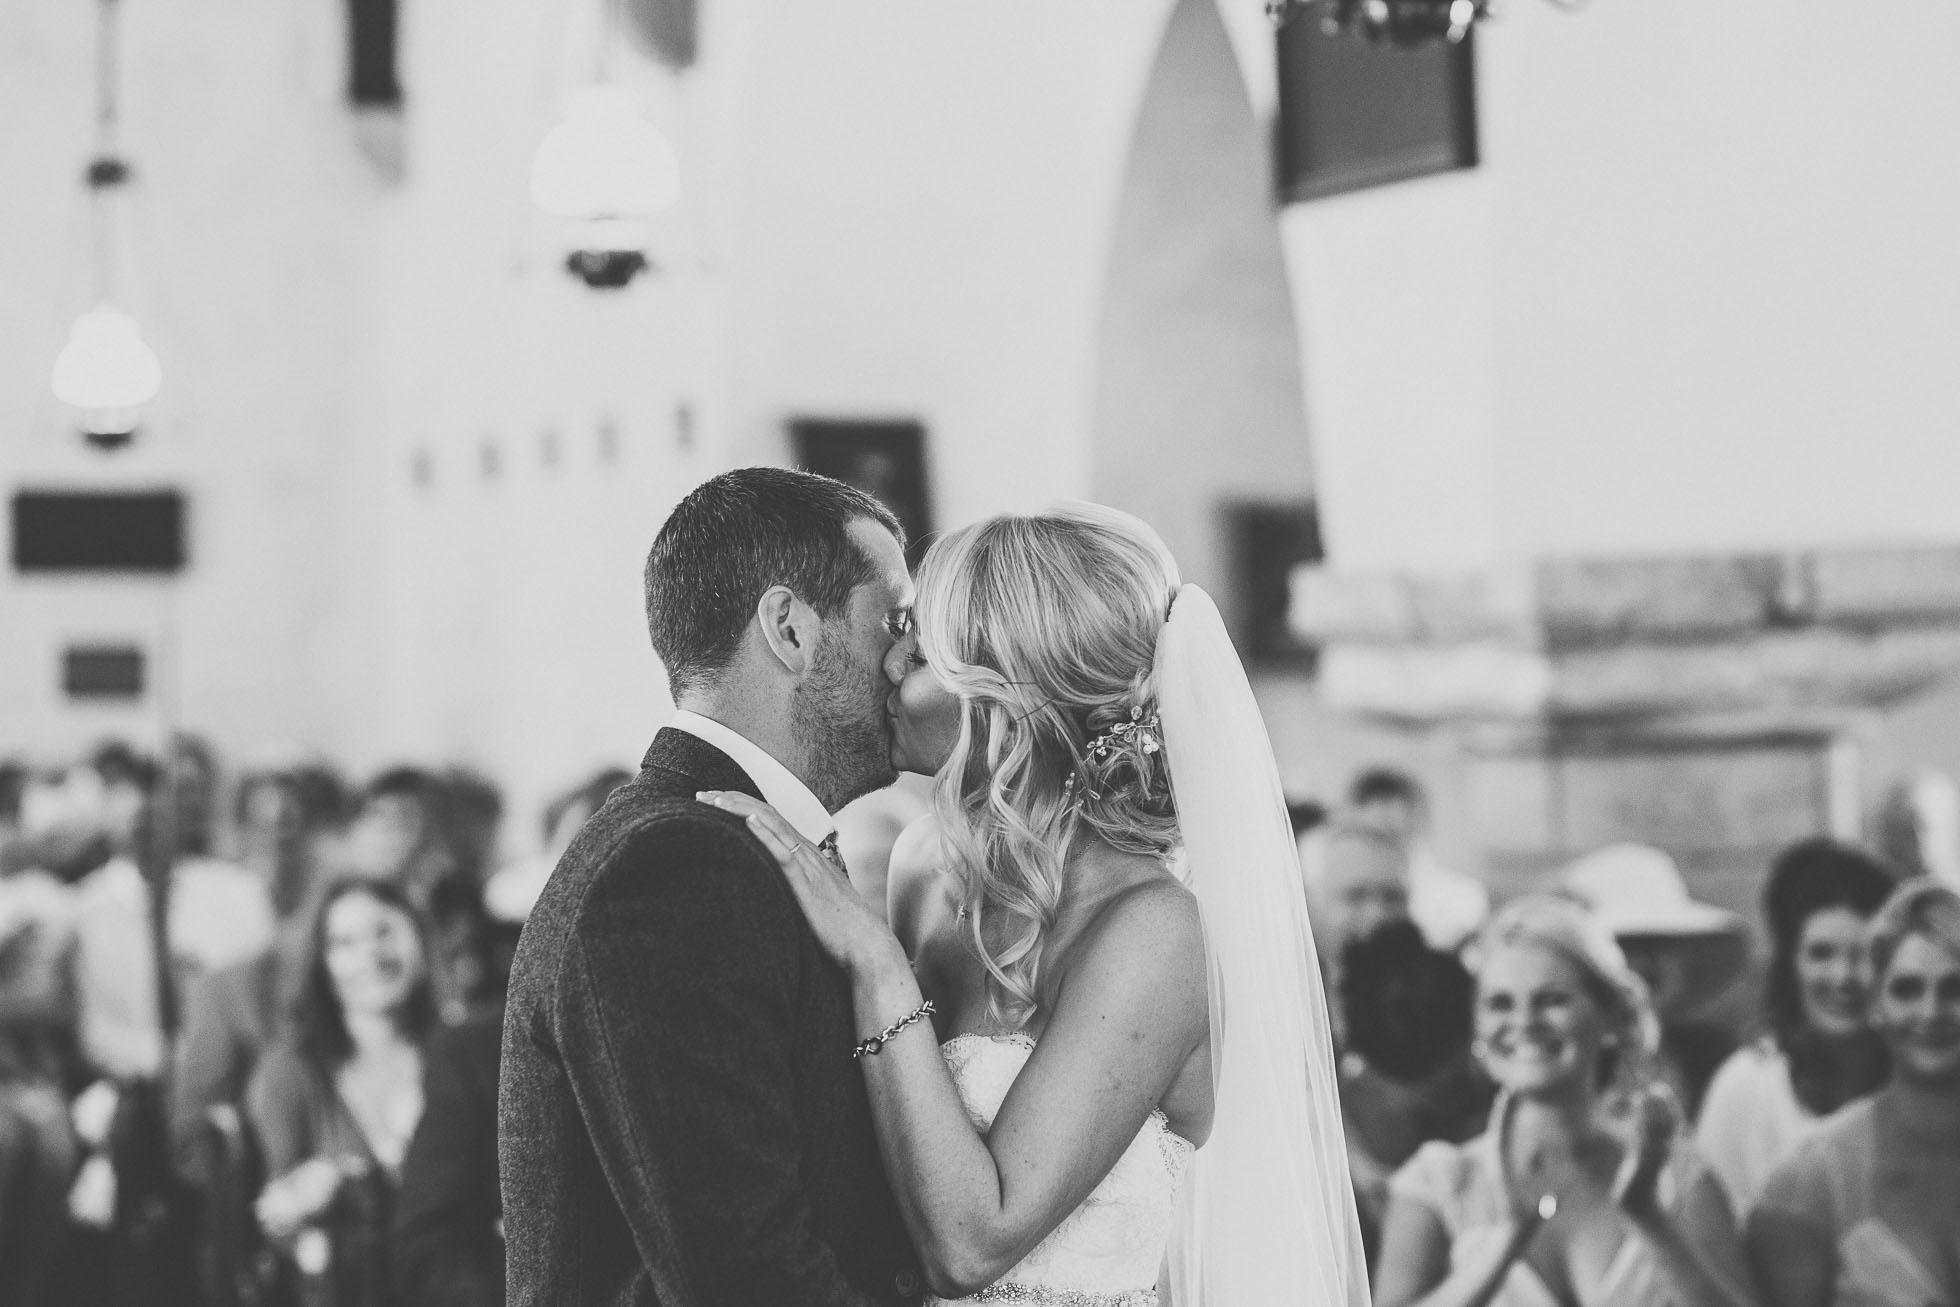 the_barn_scarborough_wedding_photographer-26.jpg